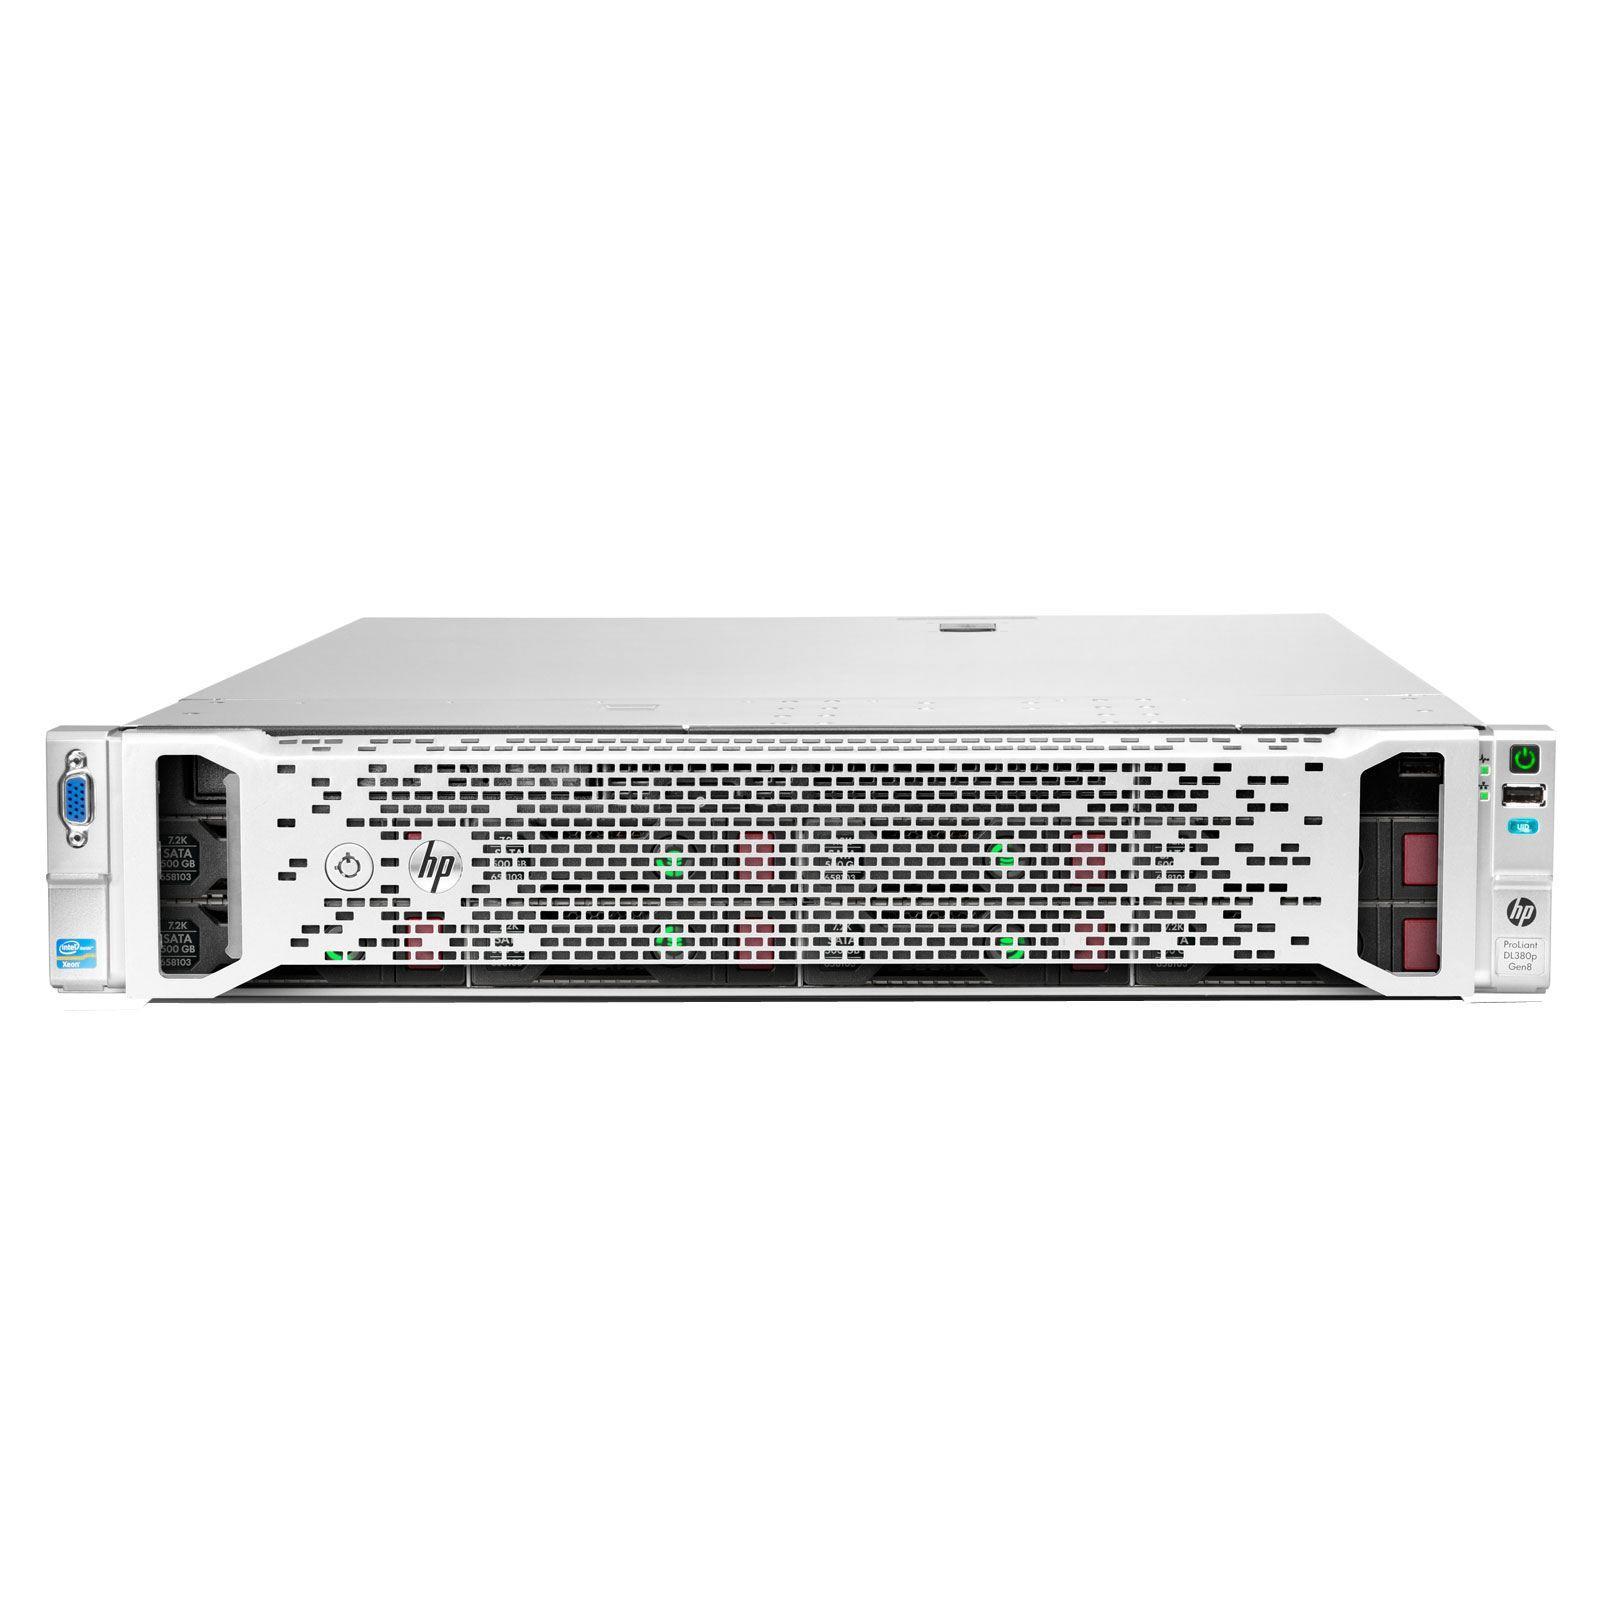 HP ProLiant DL380e Gen8 Base Server (2U) Xeon E5 (2407) 2.2GHz 8GB (No HDD) SFF with 460W Common Slot Gold Hot Plug Power Supply